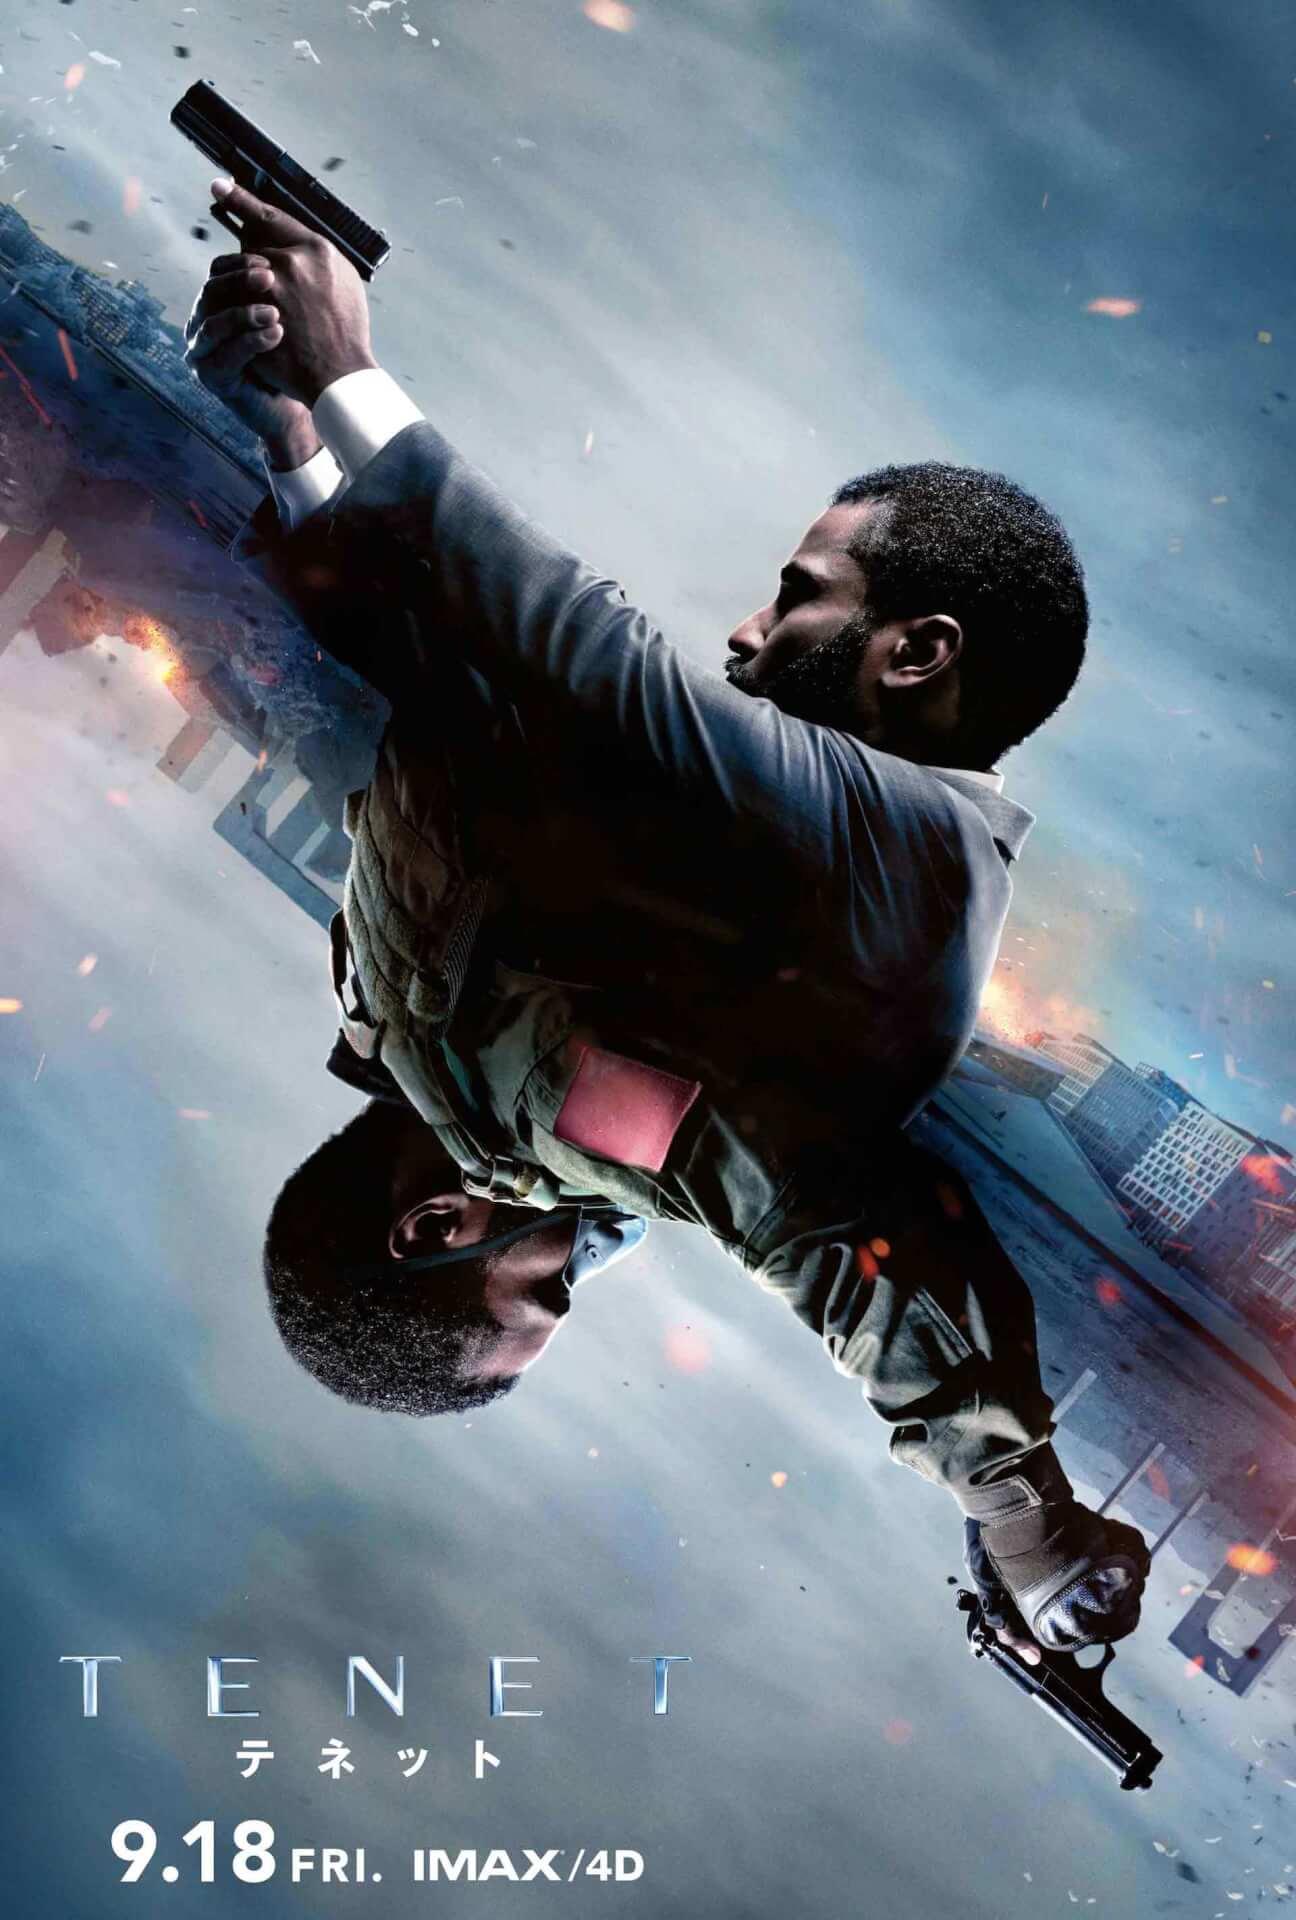 『TENET テネット』に先駆け『ダークナイト』IMAX&4D版が本日公開!謎のヒントにつながるビジュアルと15秒映像も解禁 film200710_tenet_2